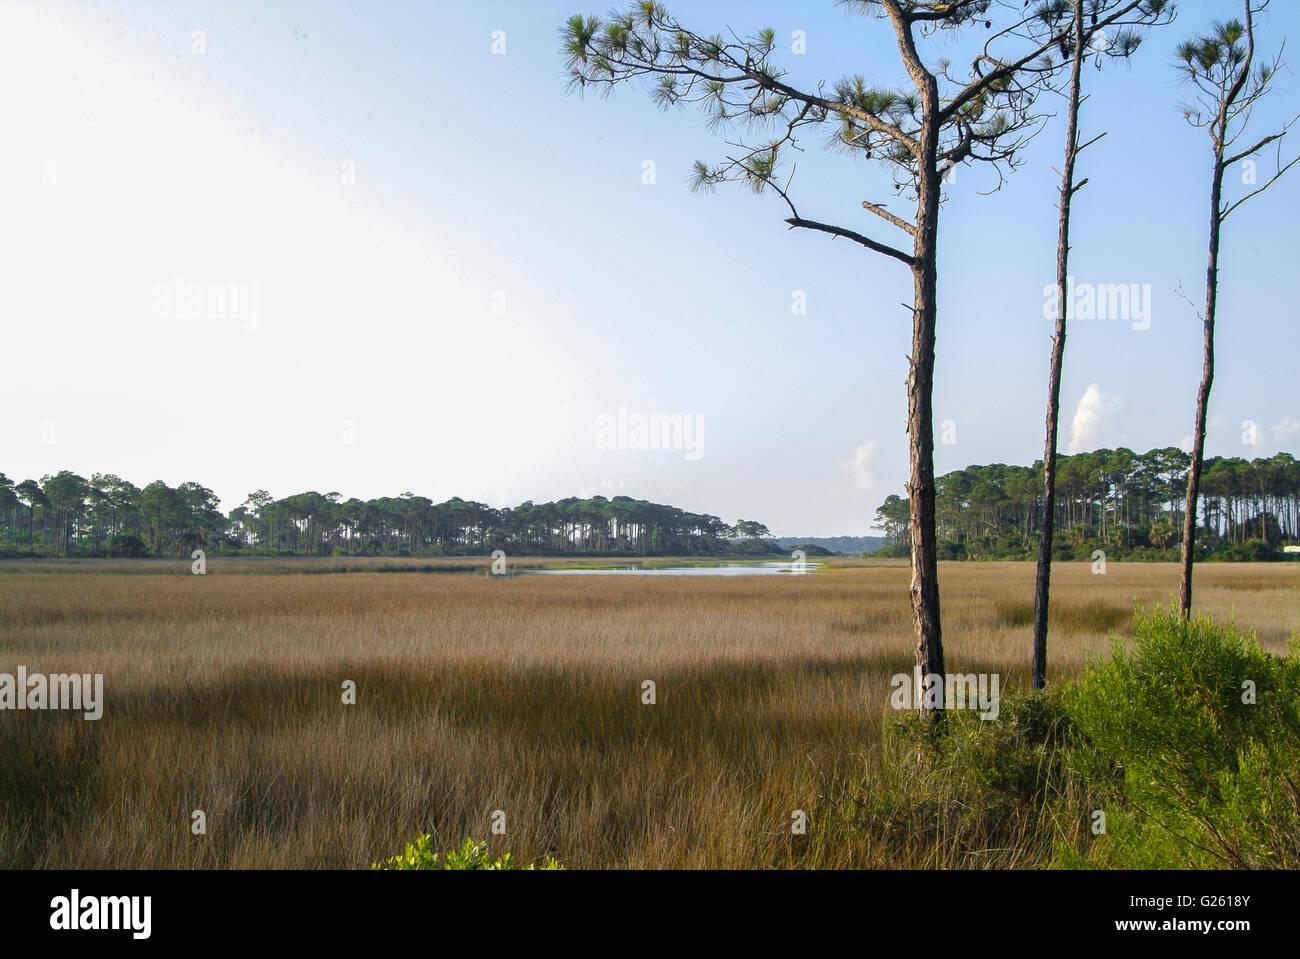 St. Joseph's Peninsula State Park, FL. Stock Photo